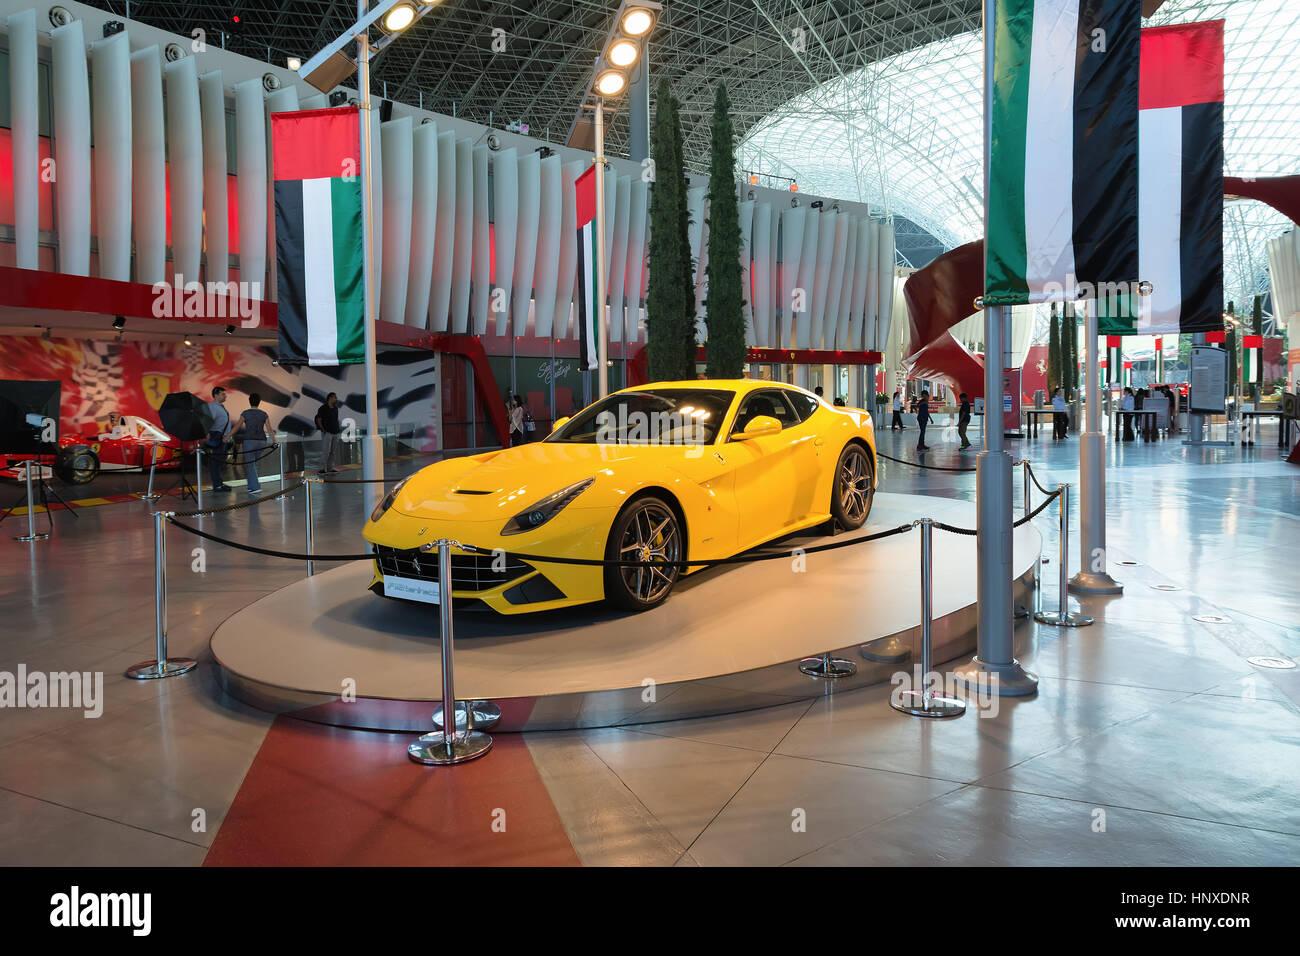 ABU DHABI, UNITED ARAB EMIRATES - DECEMBER 5, 2016: Ferrari World at Yas Island in Abu Dhabi, UAE. - Stock Image